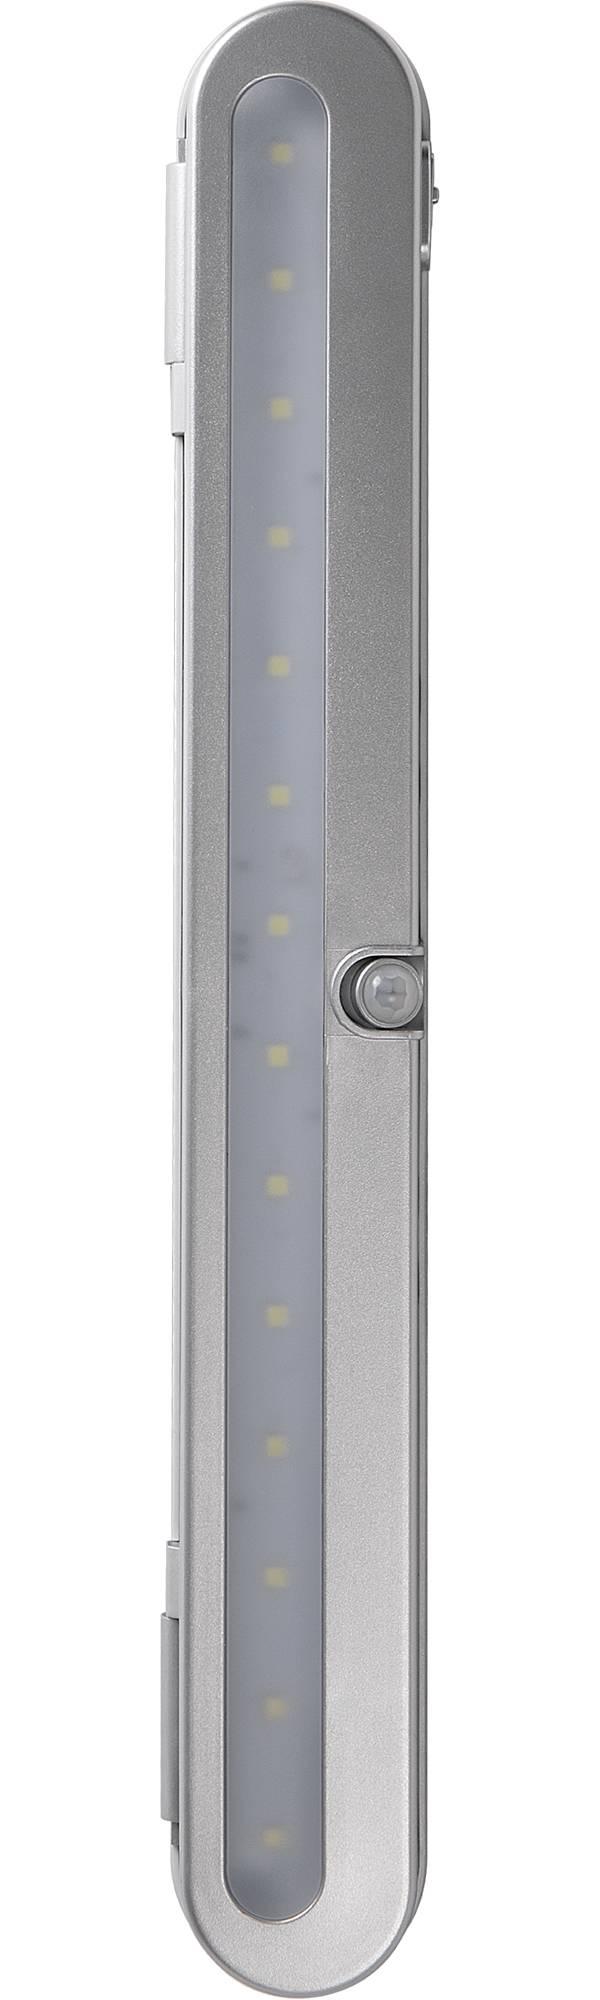 Fortress Single Bar Safe Light product image